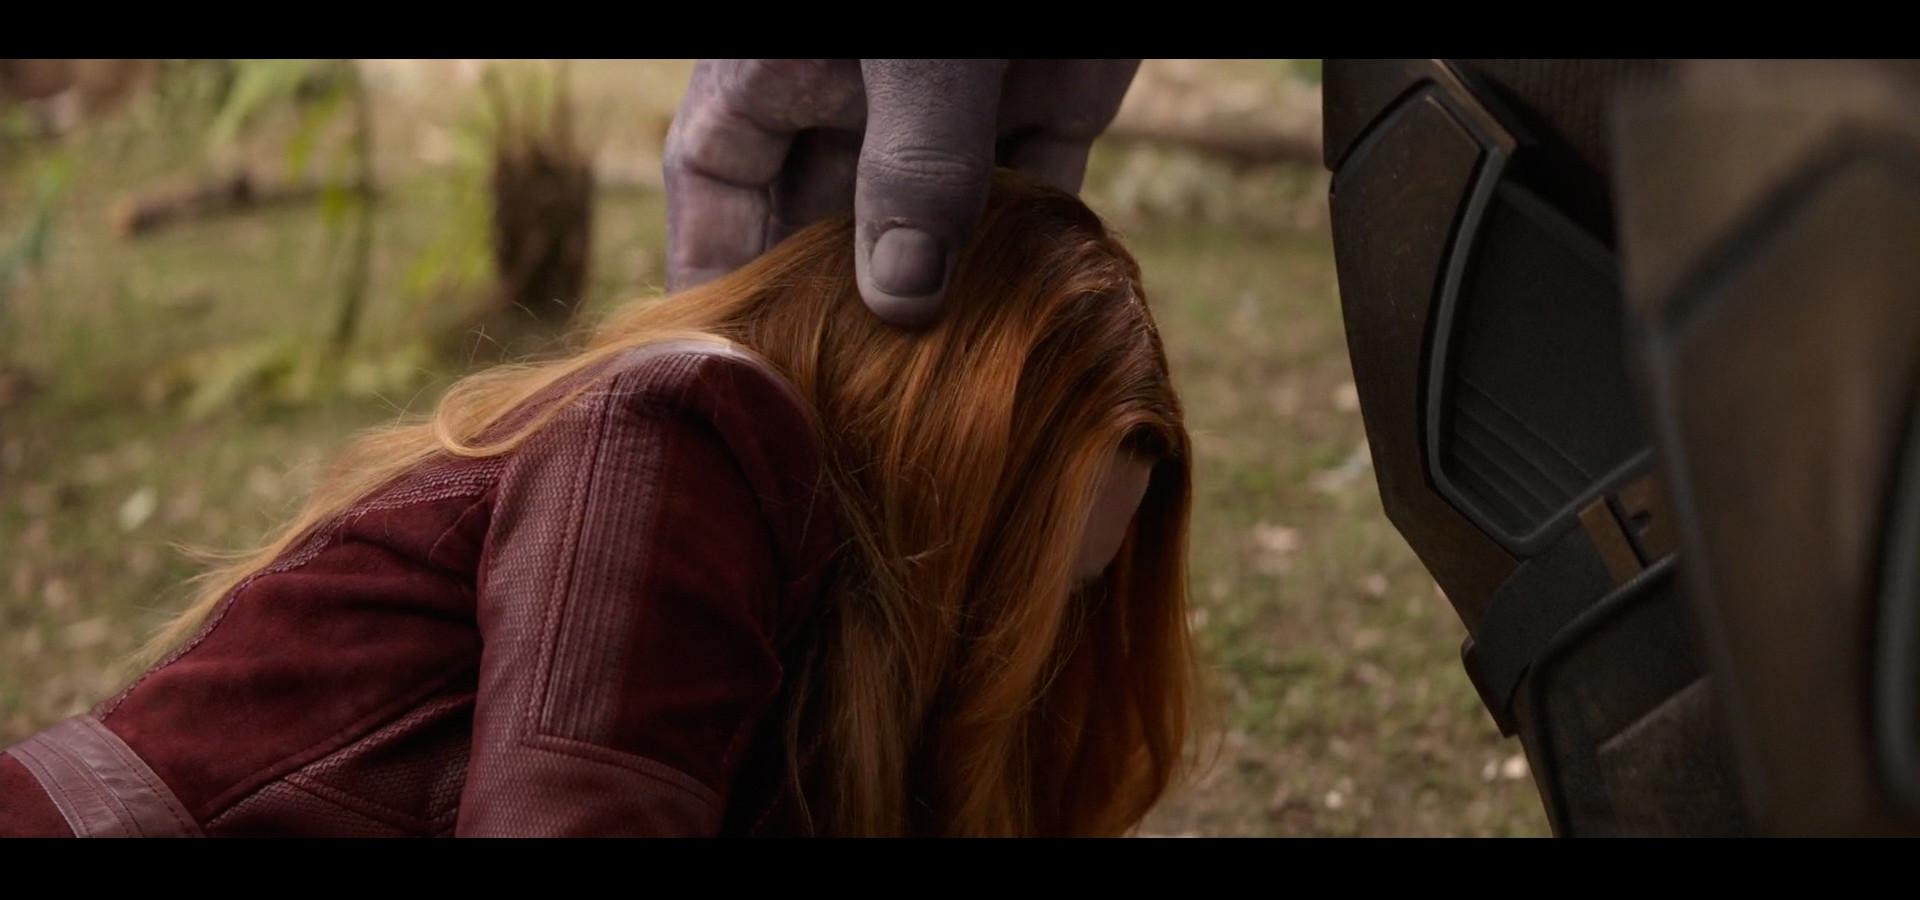 Scott knapp avengers screenshots 032